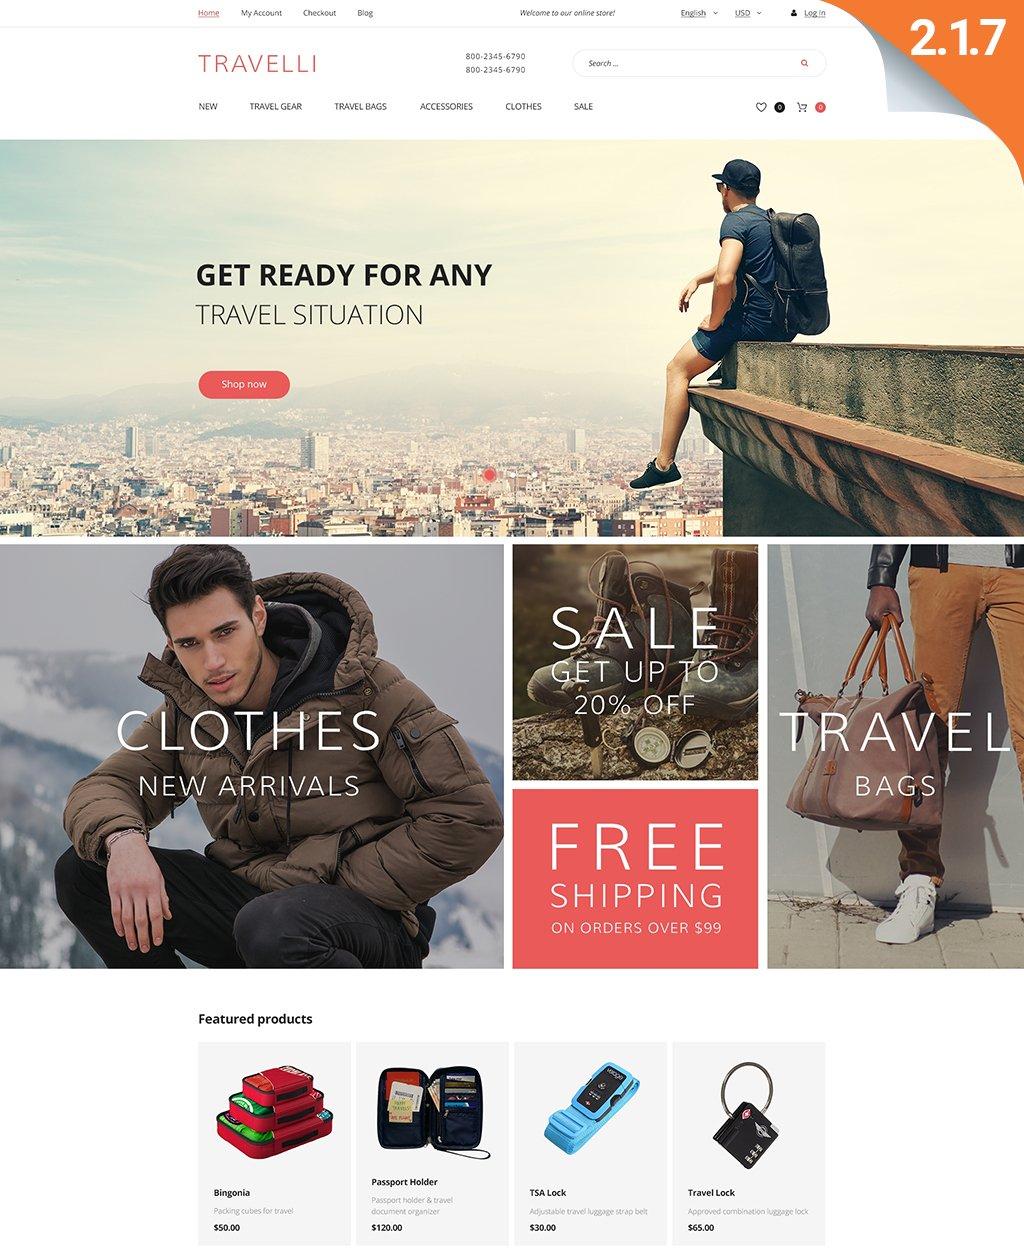 Travelli - Travel Equipment & Tourist Gear Magento Theme - screenshot